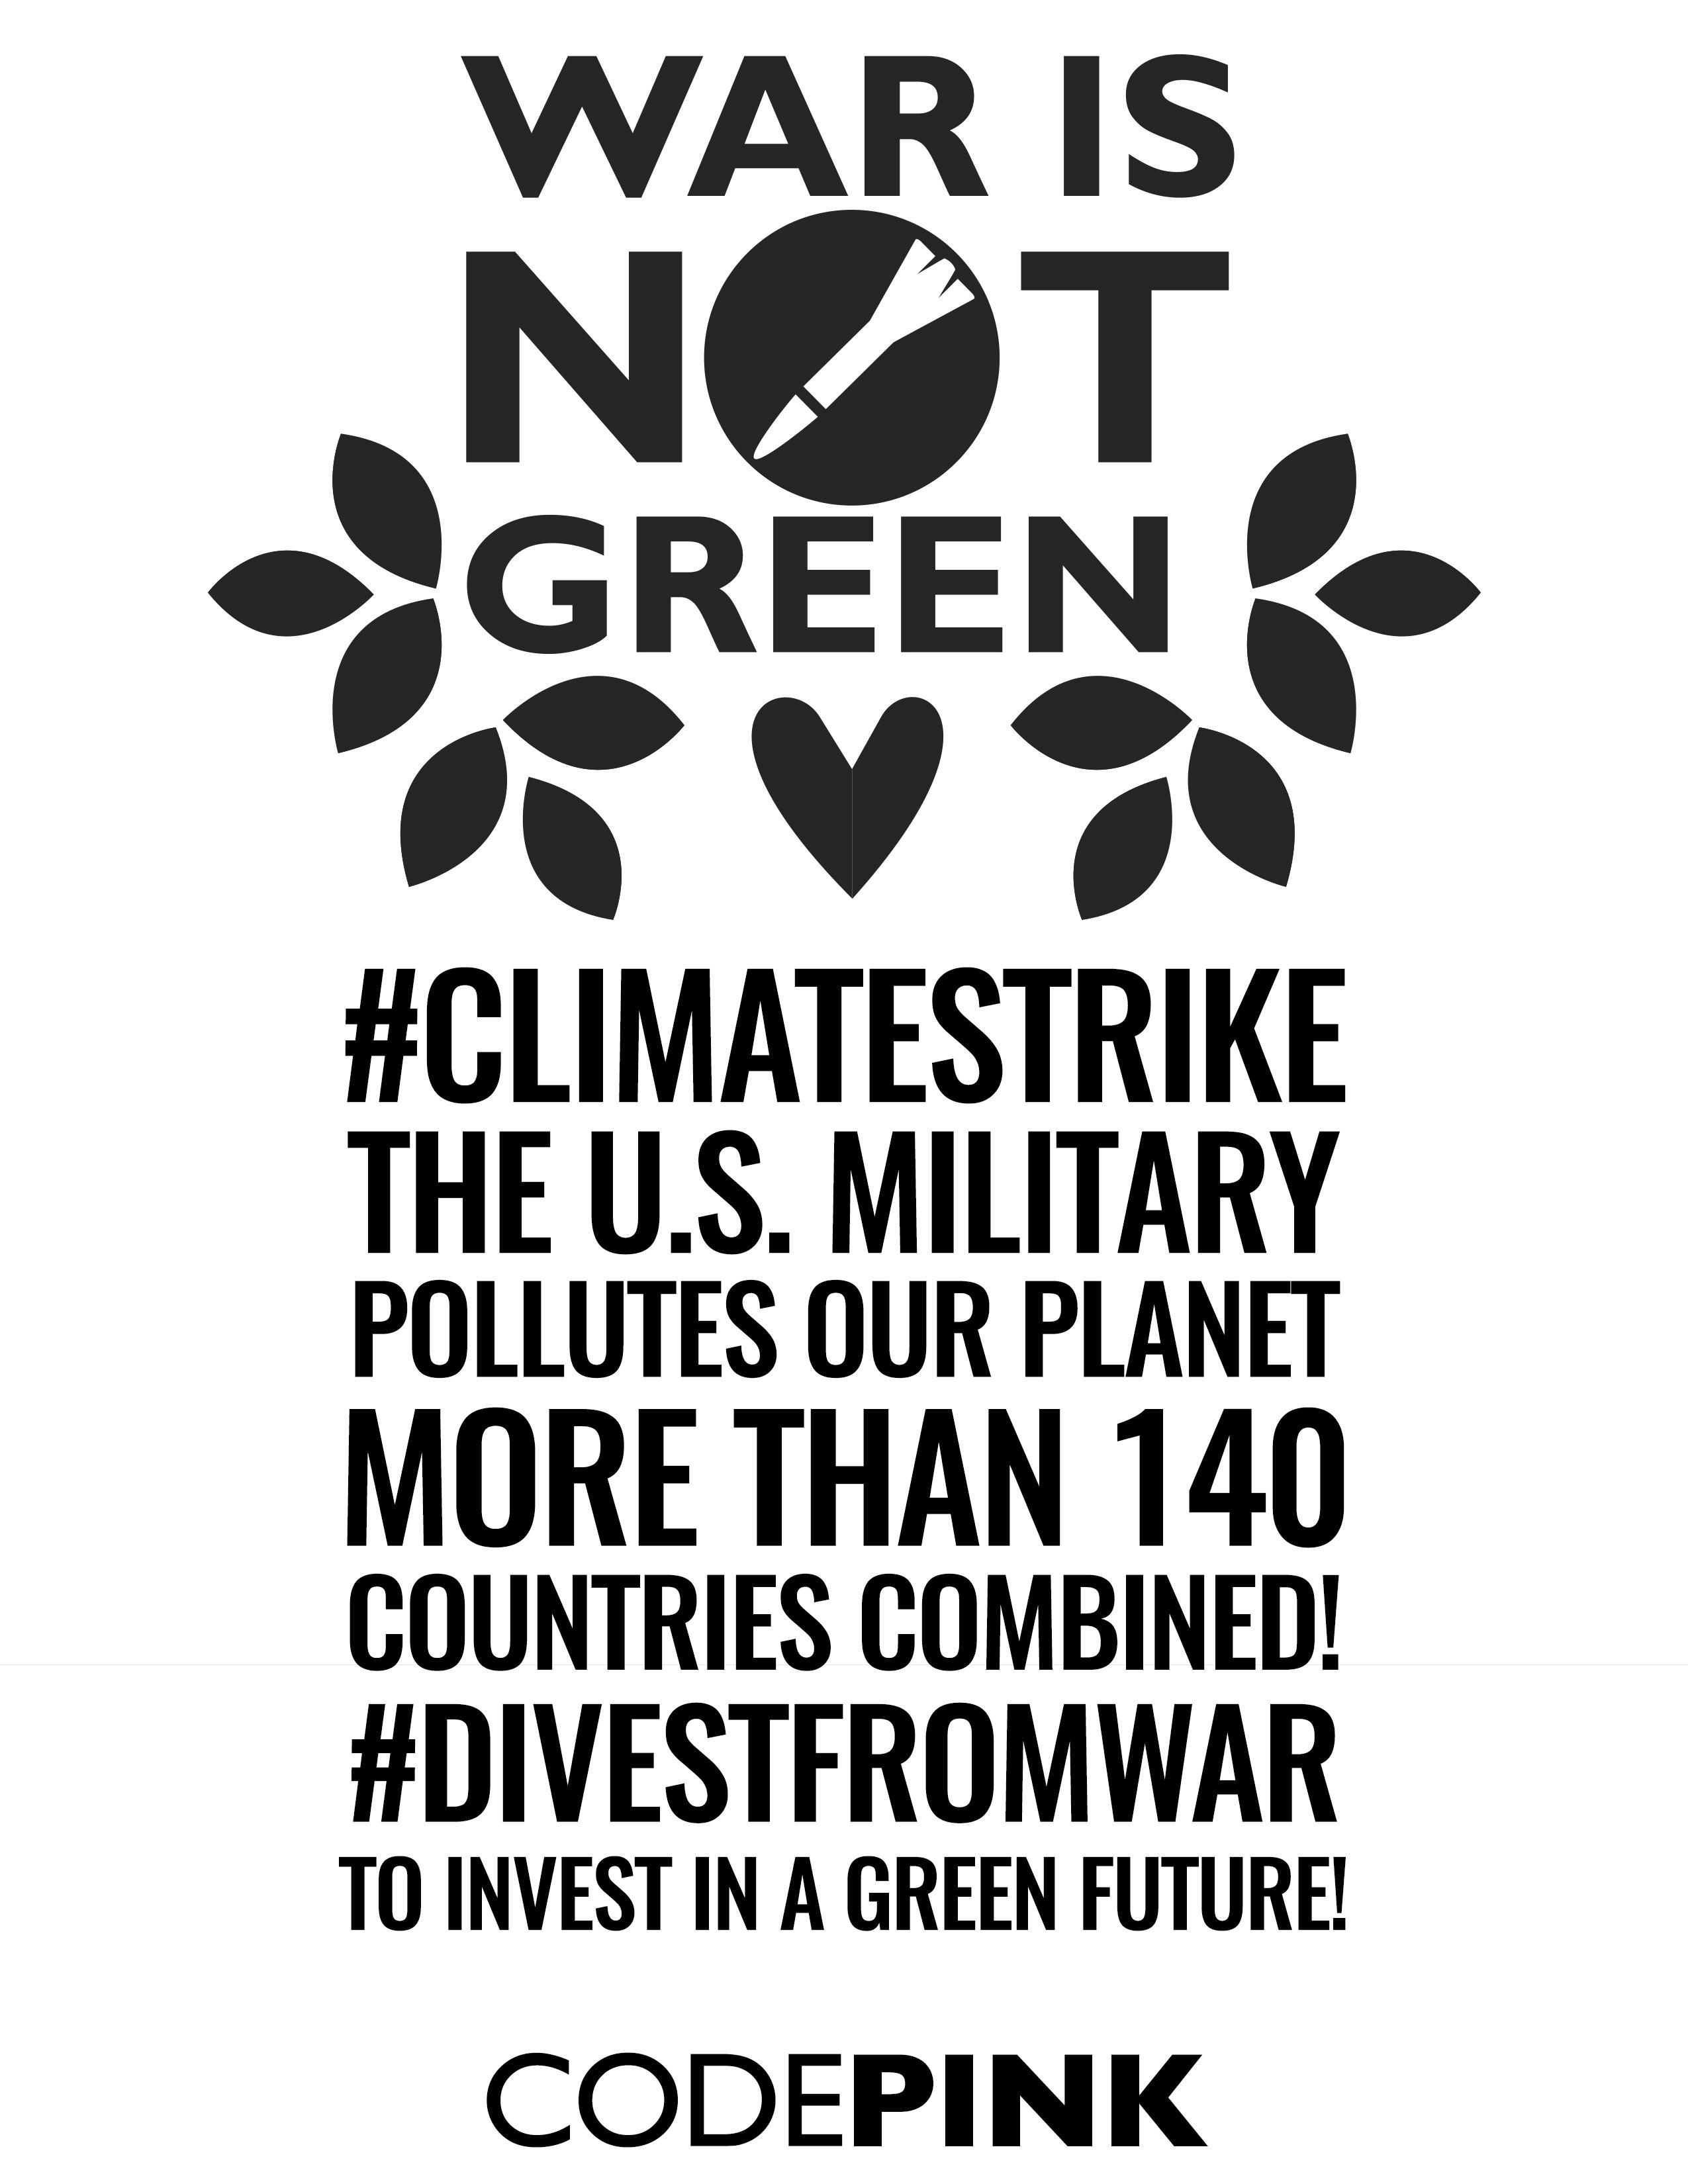 Green_Deal_ClimateStrike_A4_vertical_color.jpg